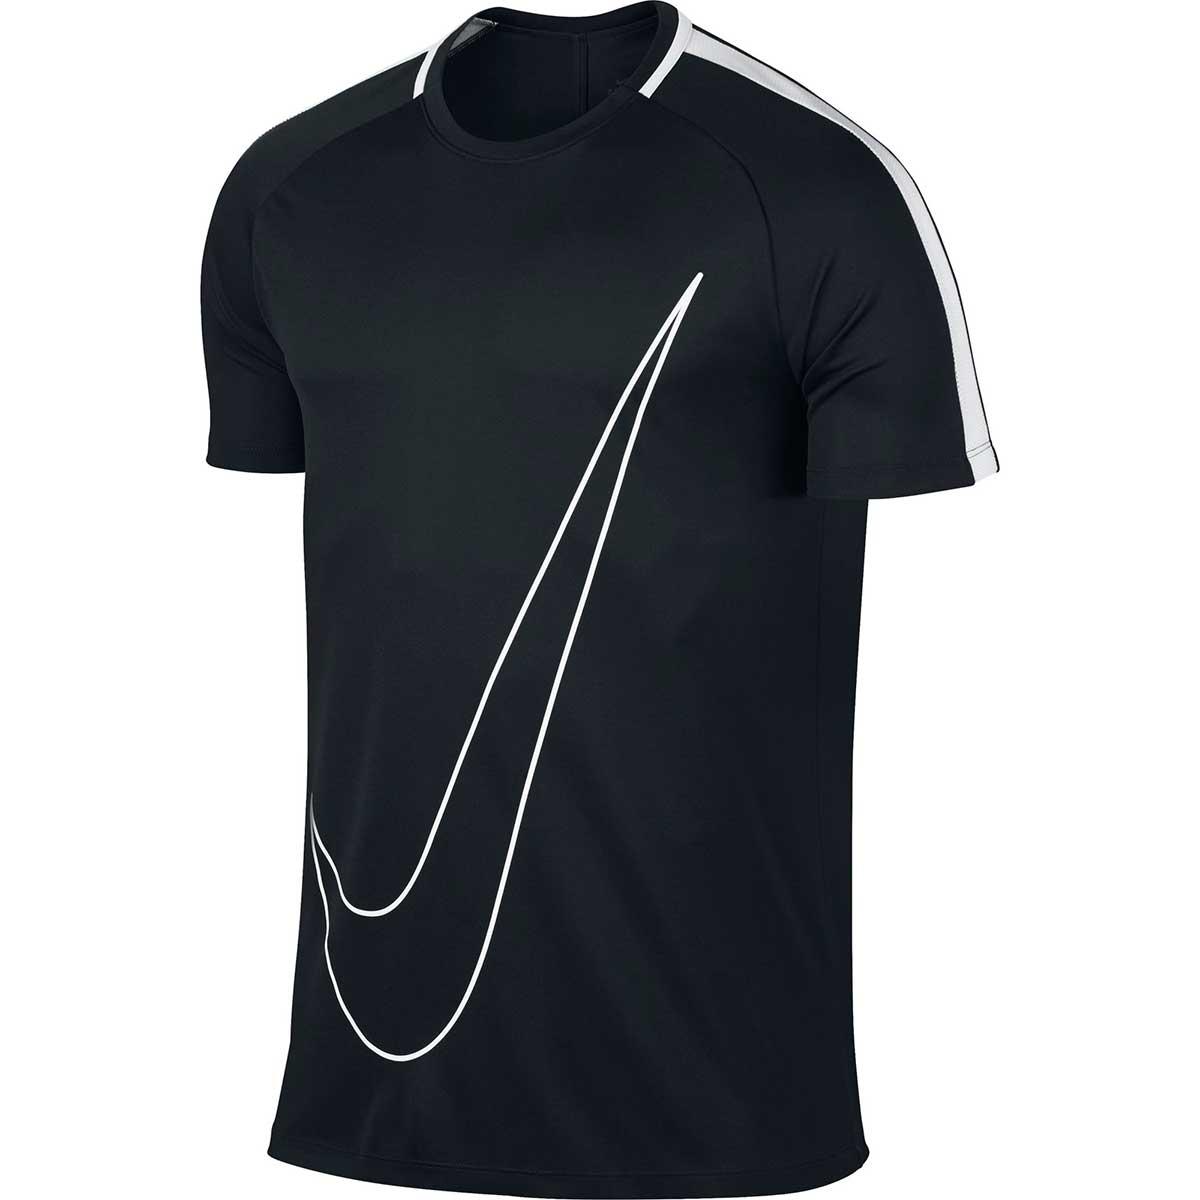 0ac322b8 Buy Nike Men's Dry Academy Football T-Shirt (Black/White) Online